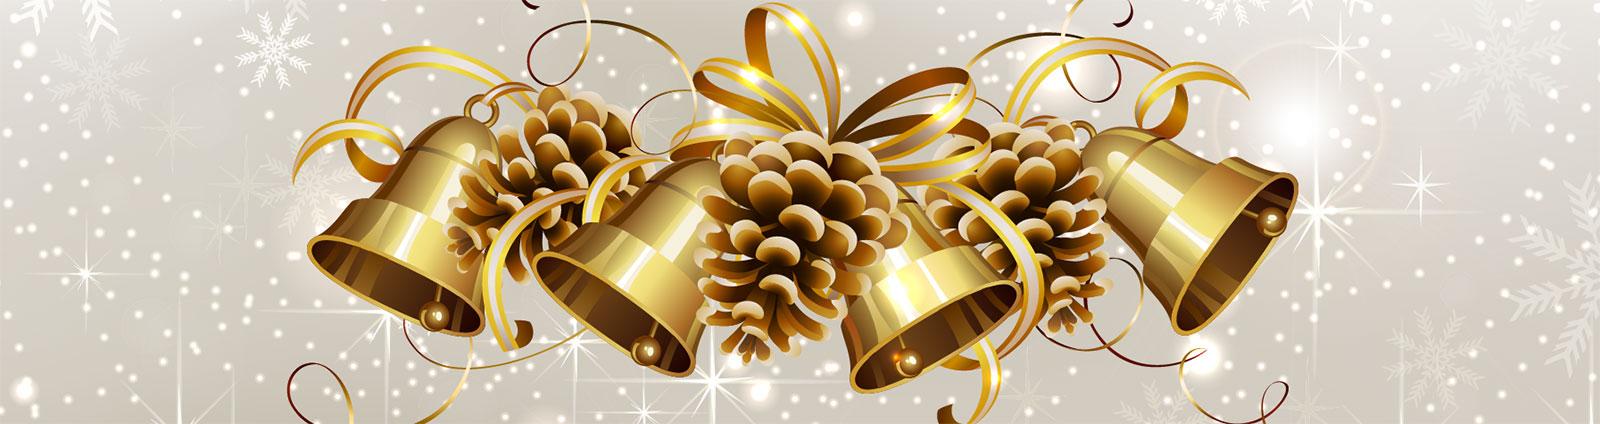 Holiday Concert Bells